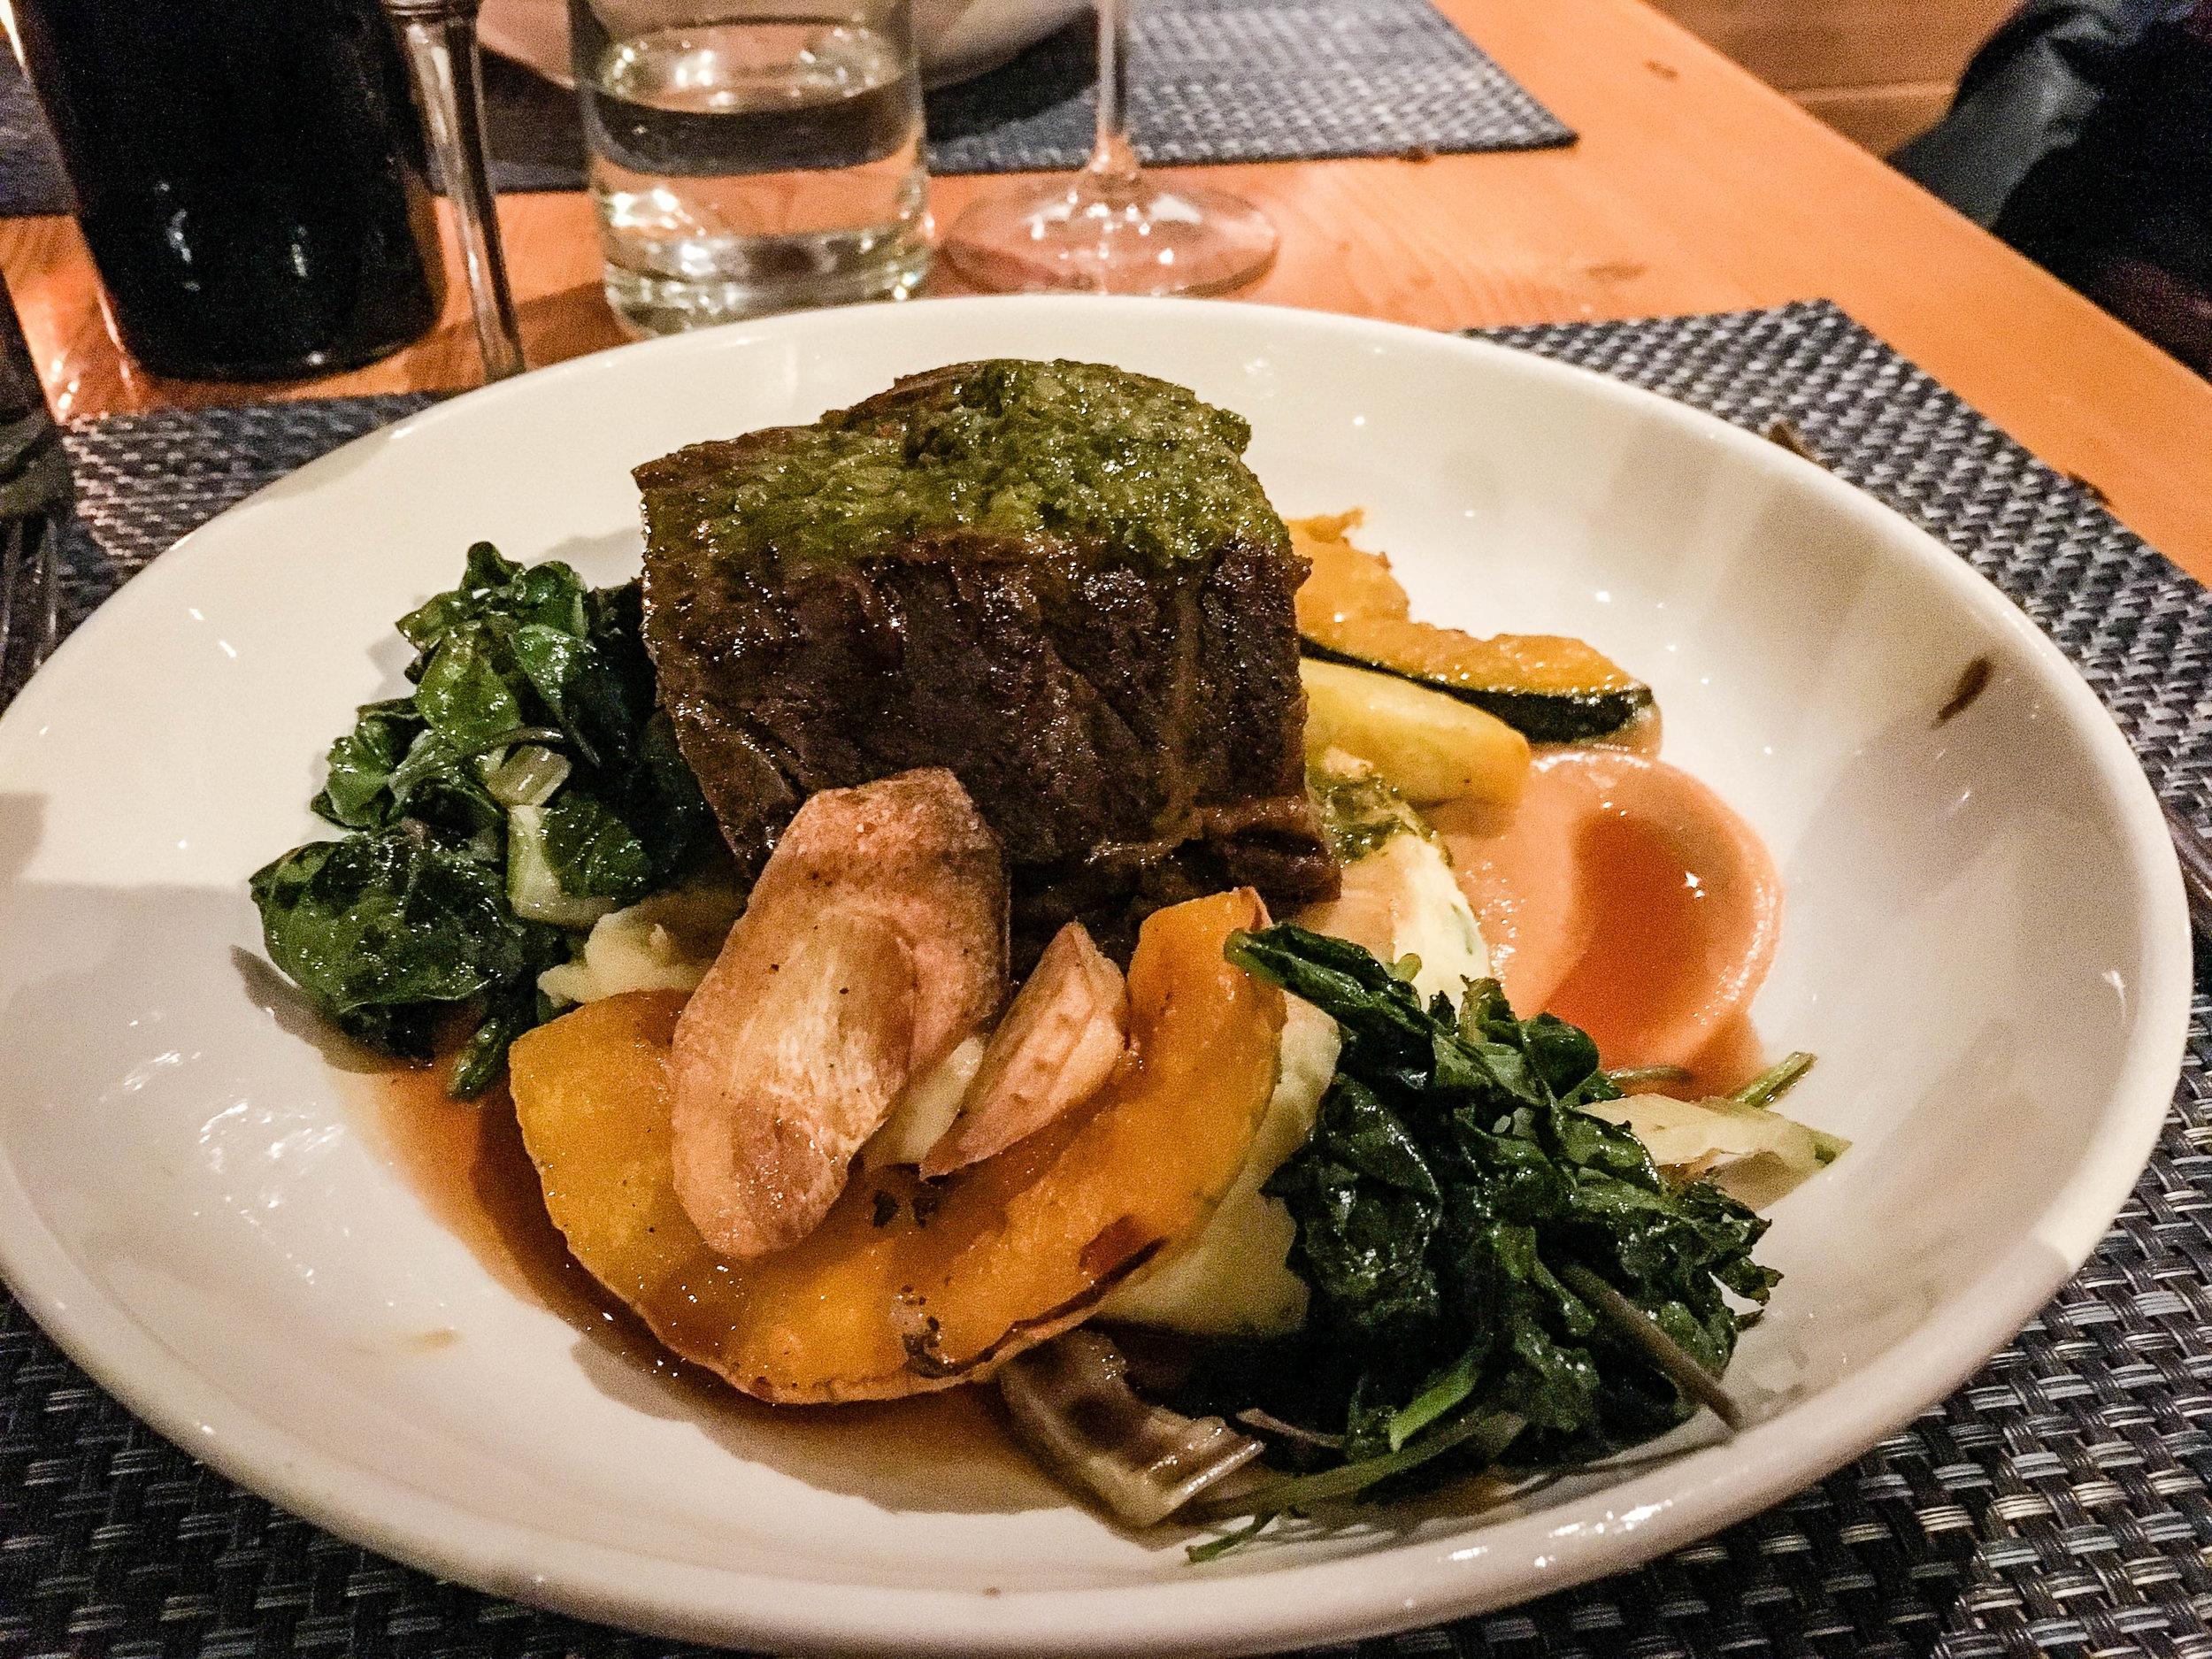 Niagara on the Lake Ravine Restaurant foodie plate